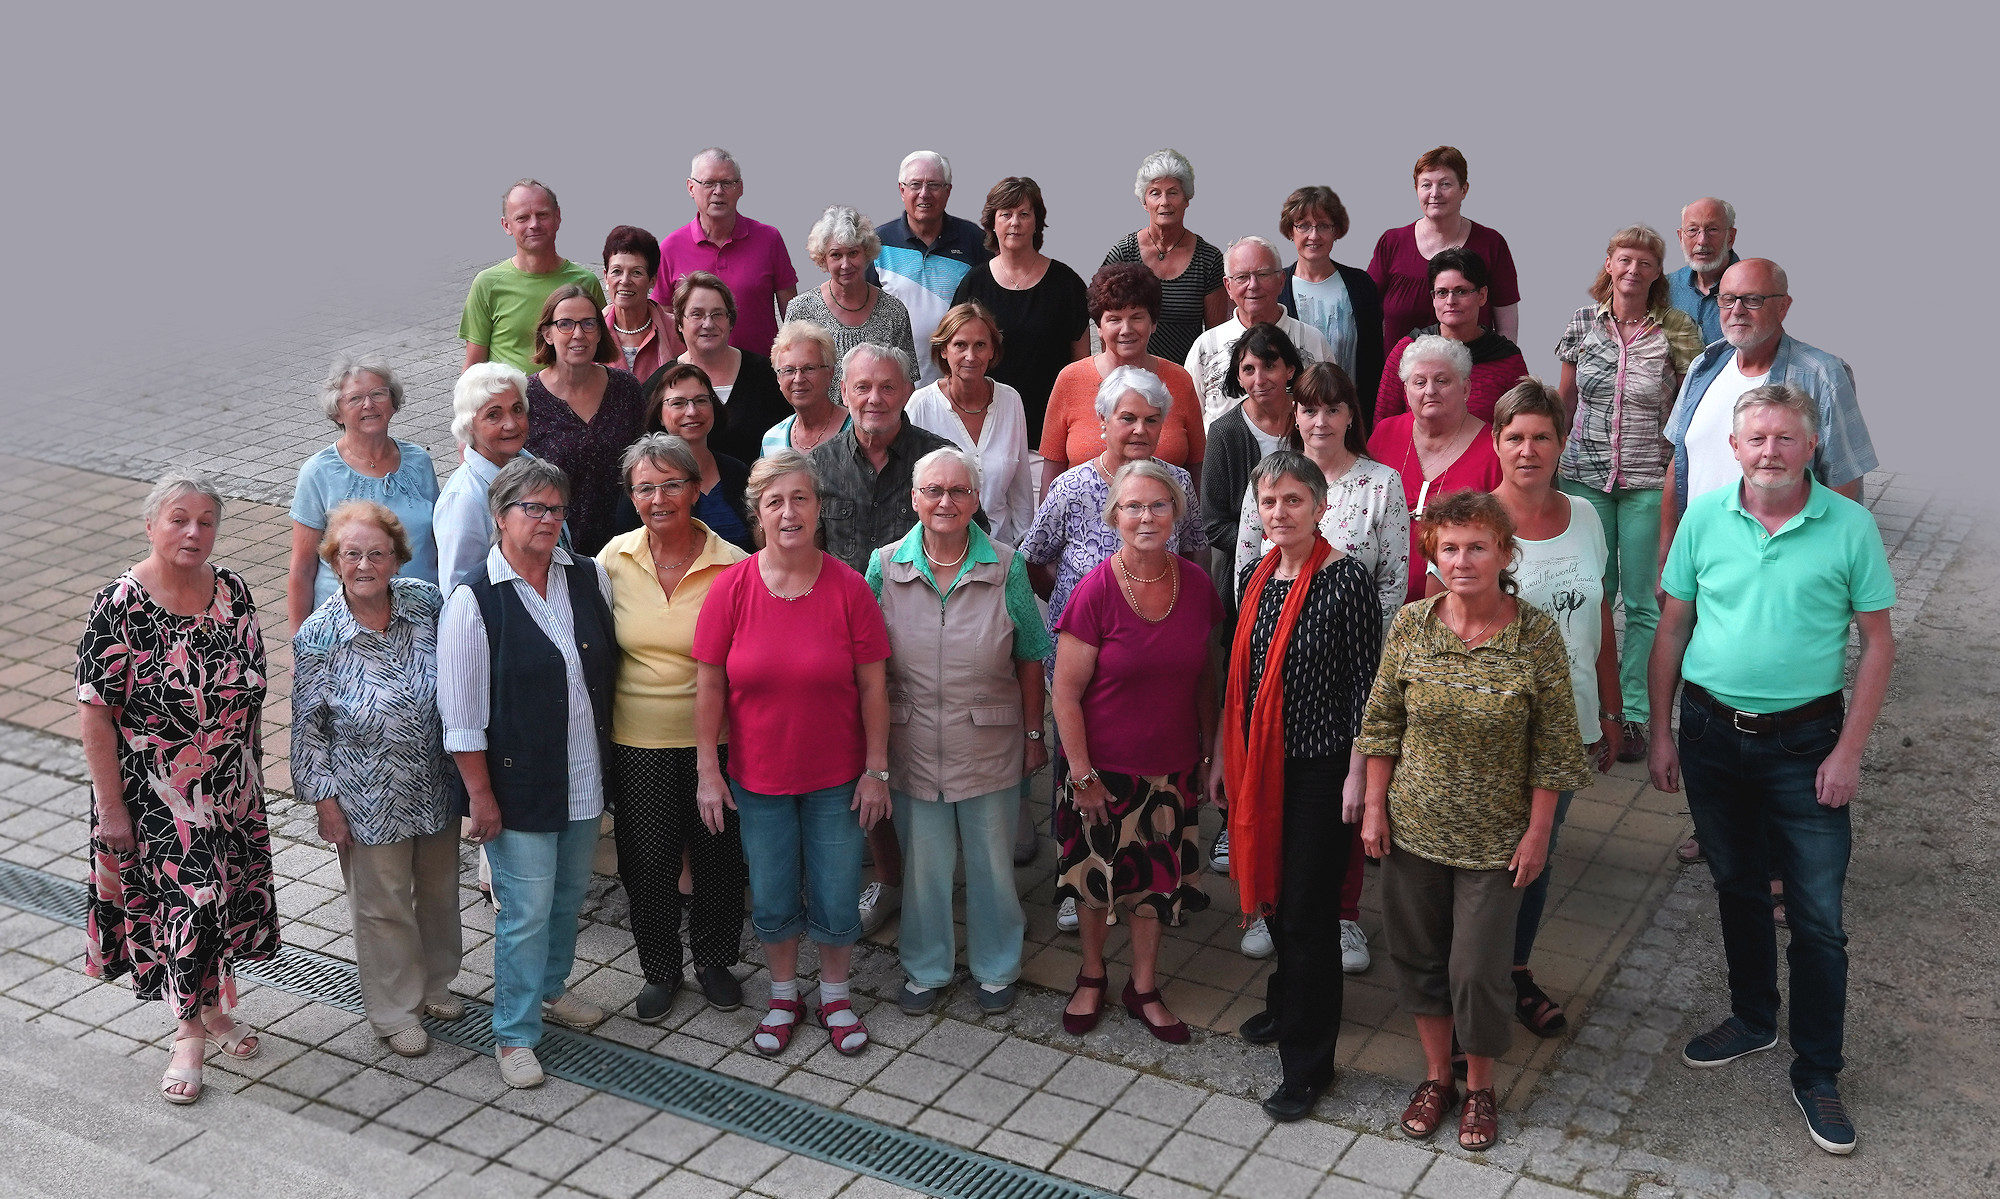 Carl-Maria-von-weber-Chor